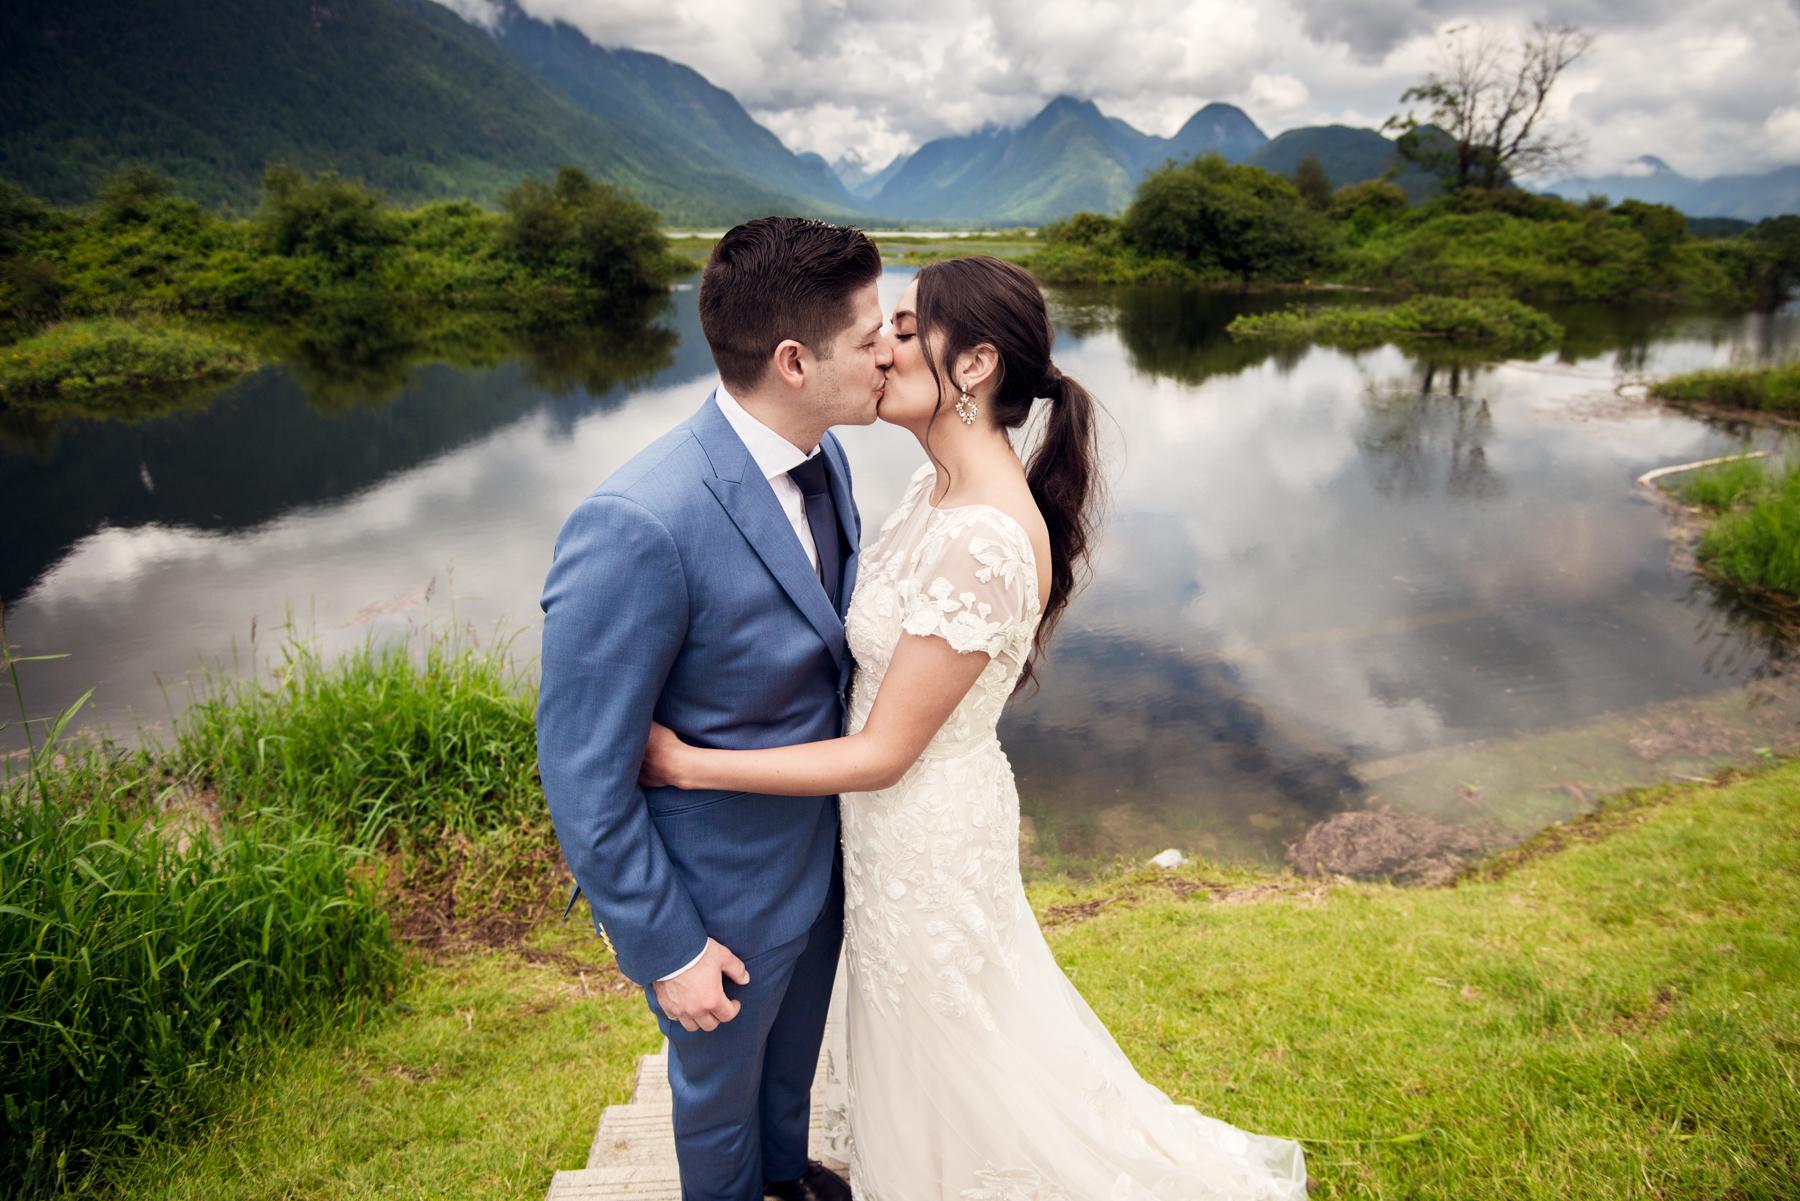 dp-wedding-web-023